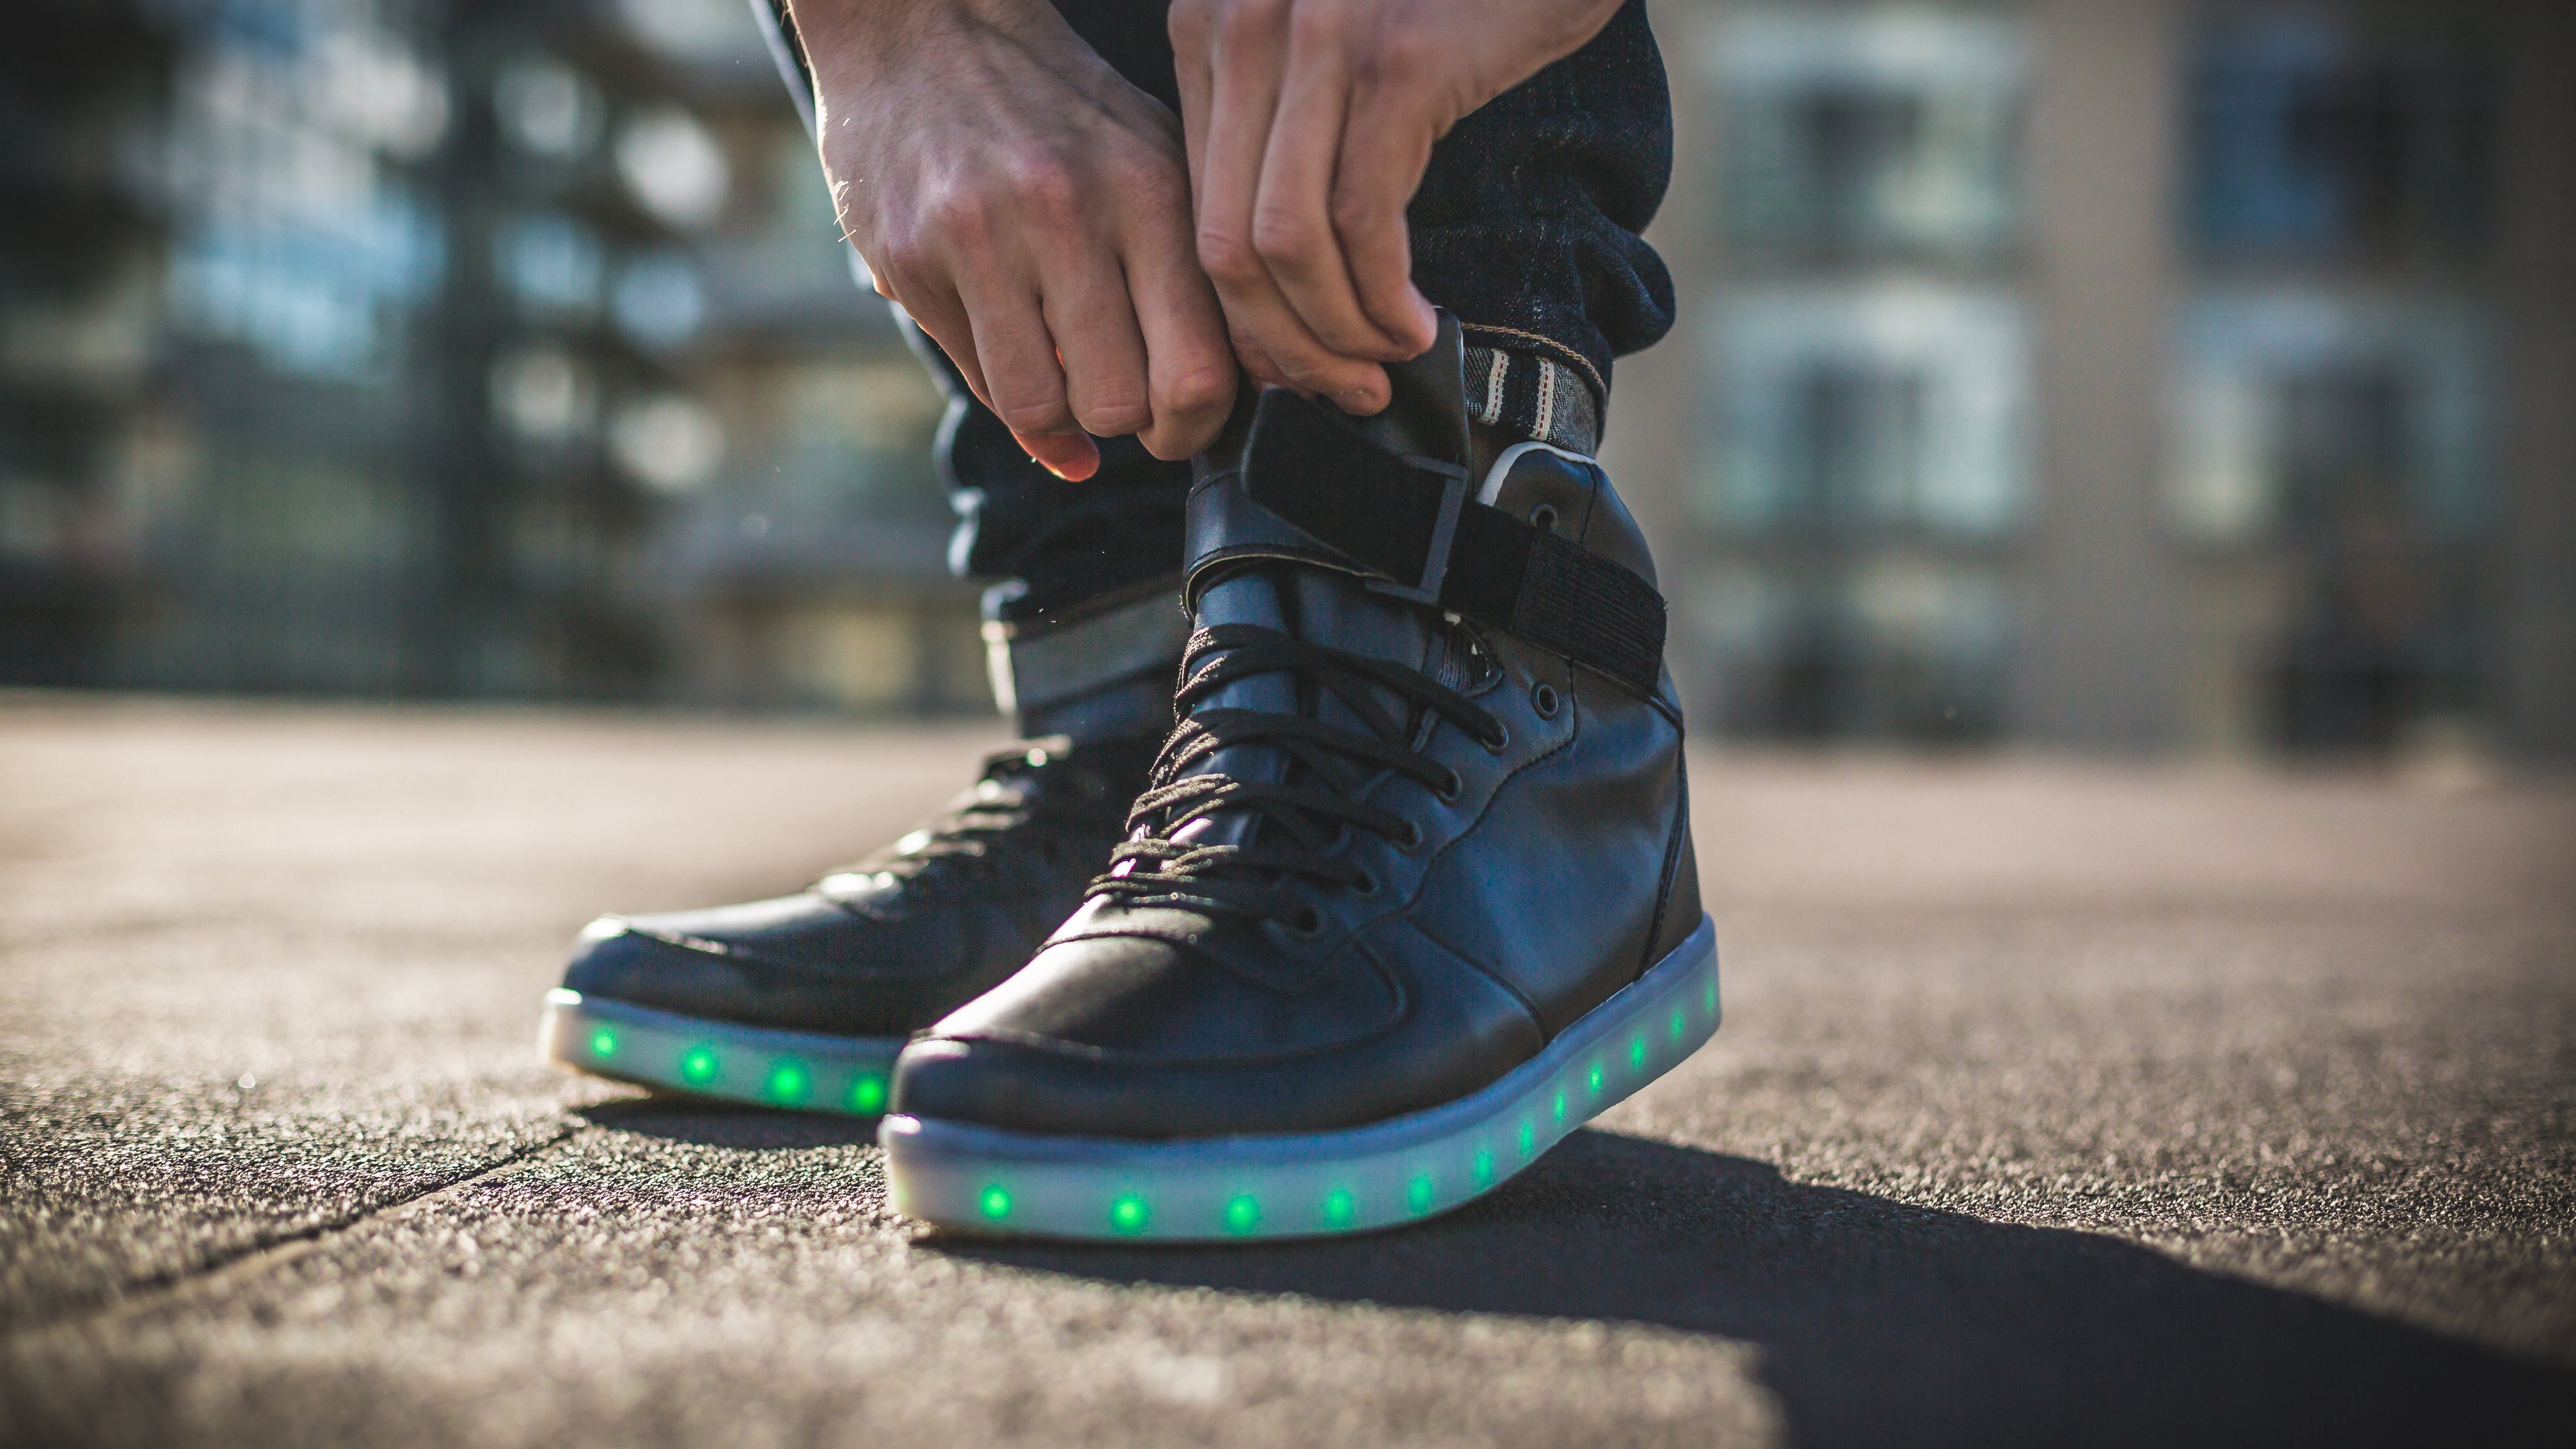 sneakers legs shoes backlight 4k 1540060850 - sneakers, legs, shoes, backlight 4k - sneakers, Shoes, legs